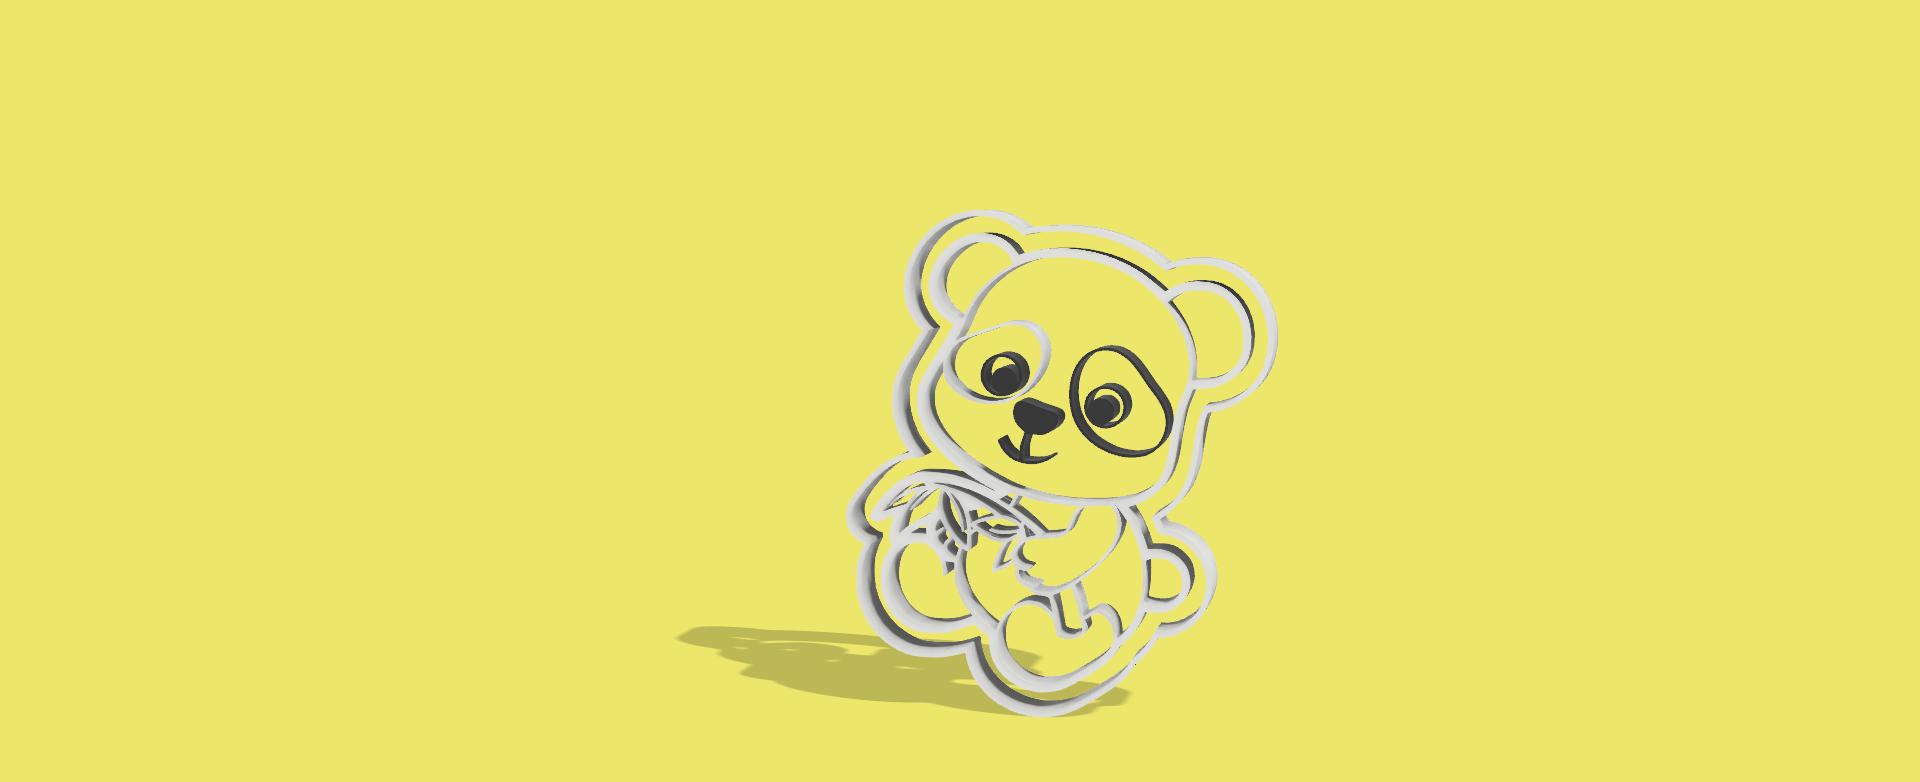 pandi bambu v1.png Download STL file Panda Bambu cookiie cutter • Design to 3D print, Geralp